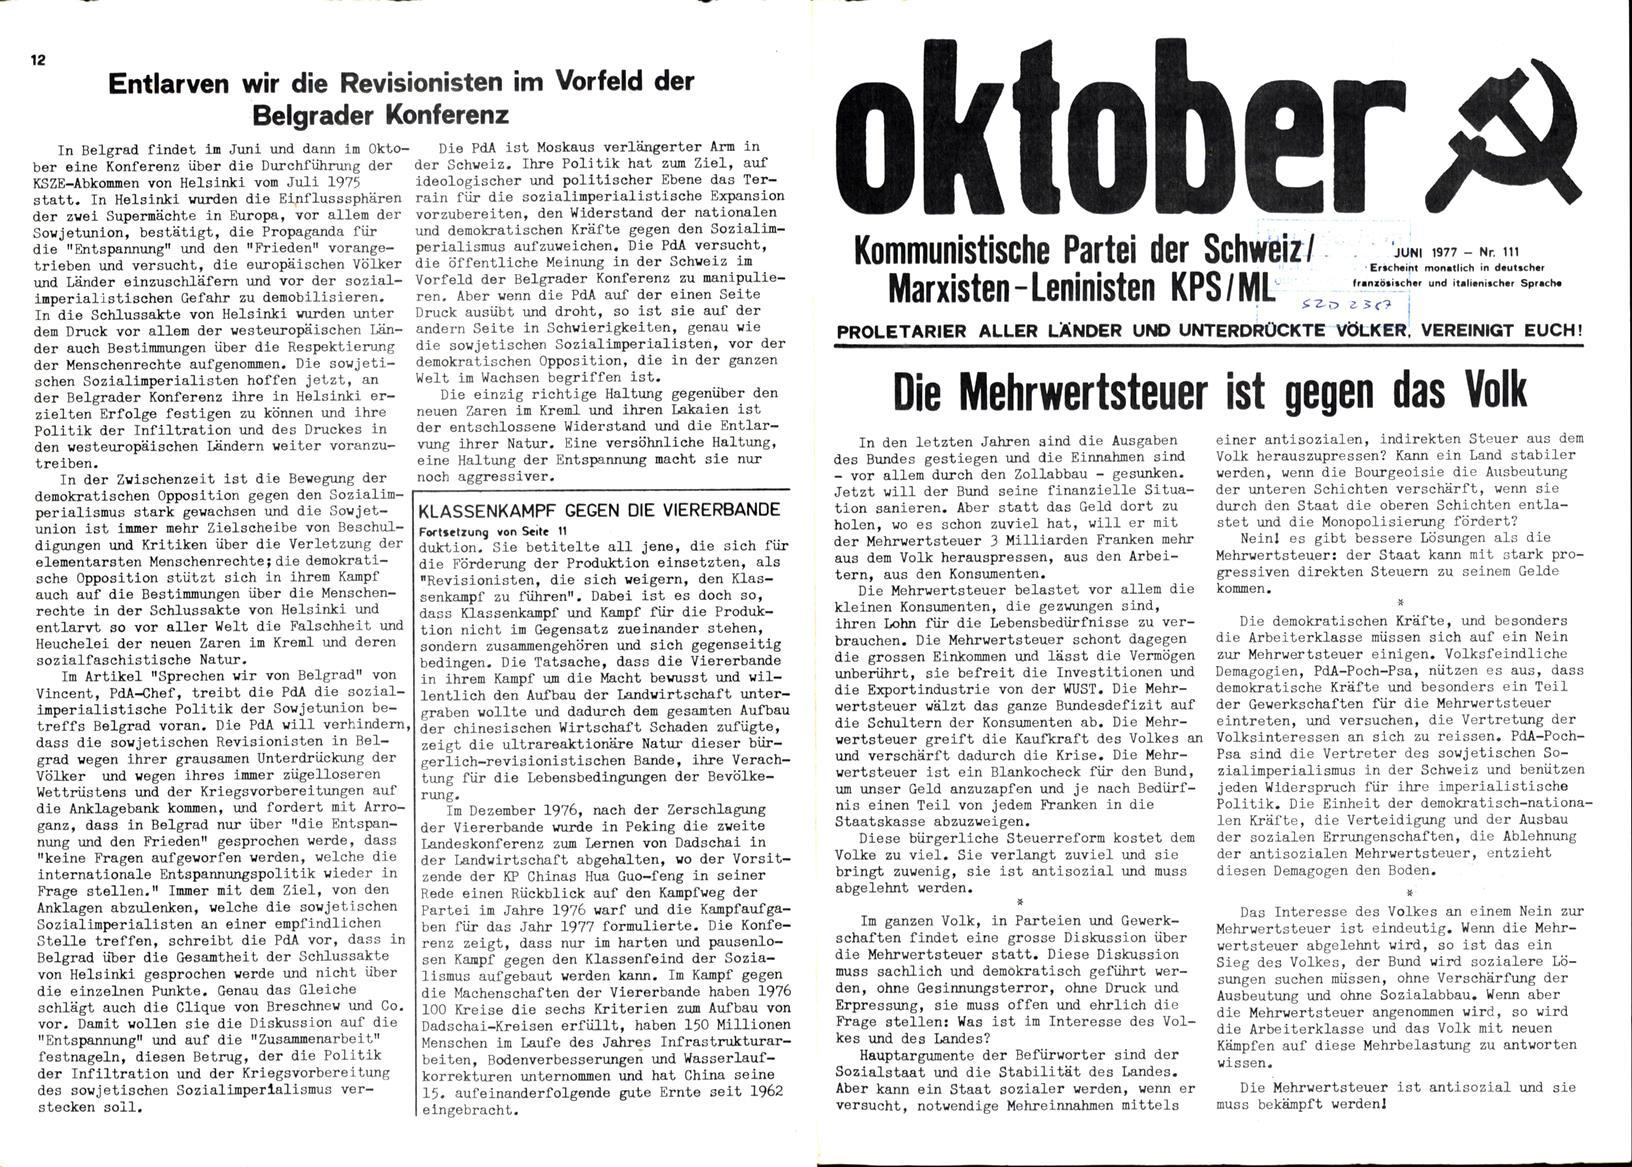 Schweiz_KPSML_Oktober_19770600_111_001